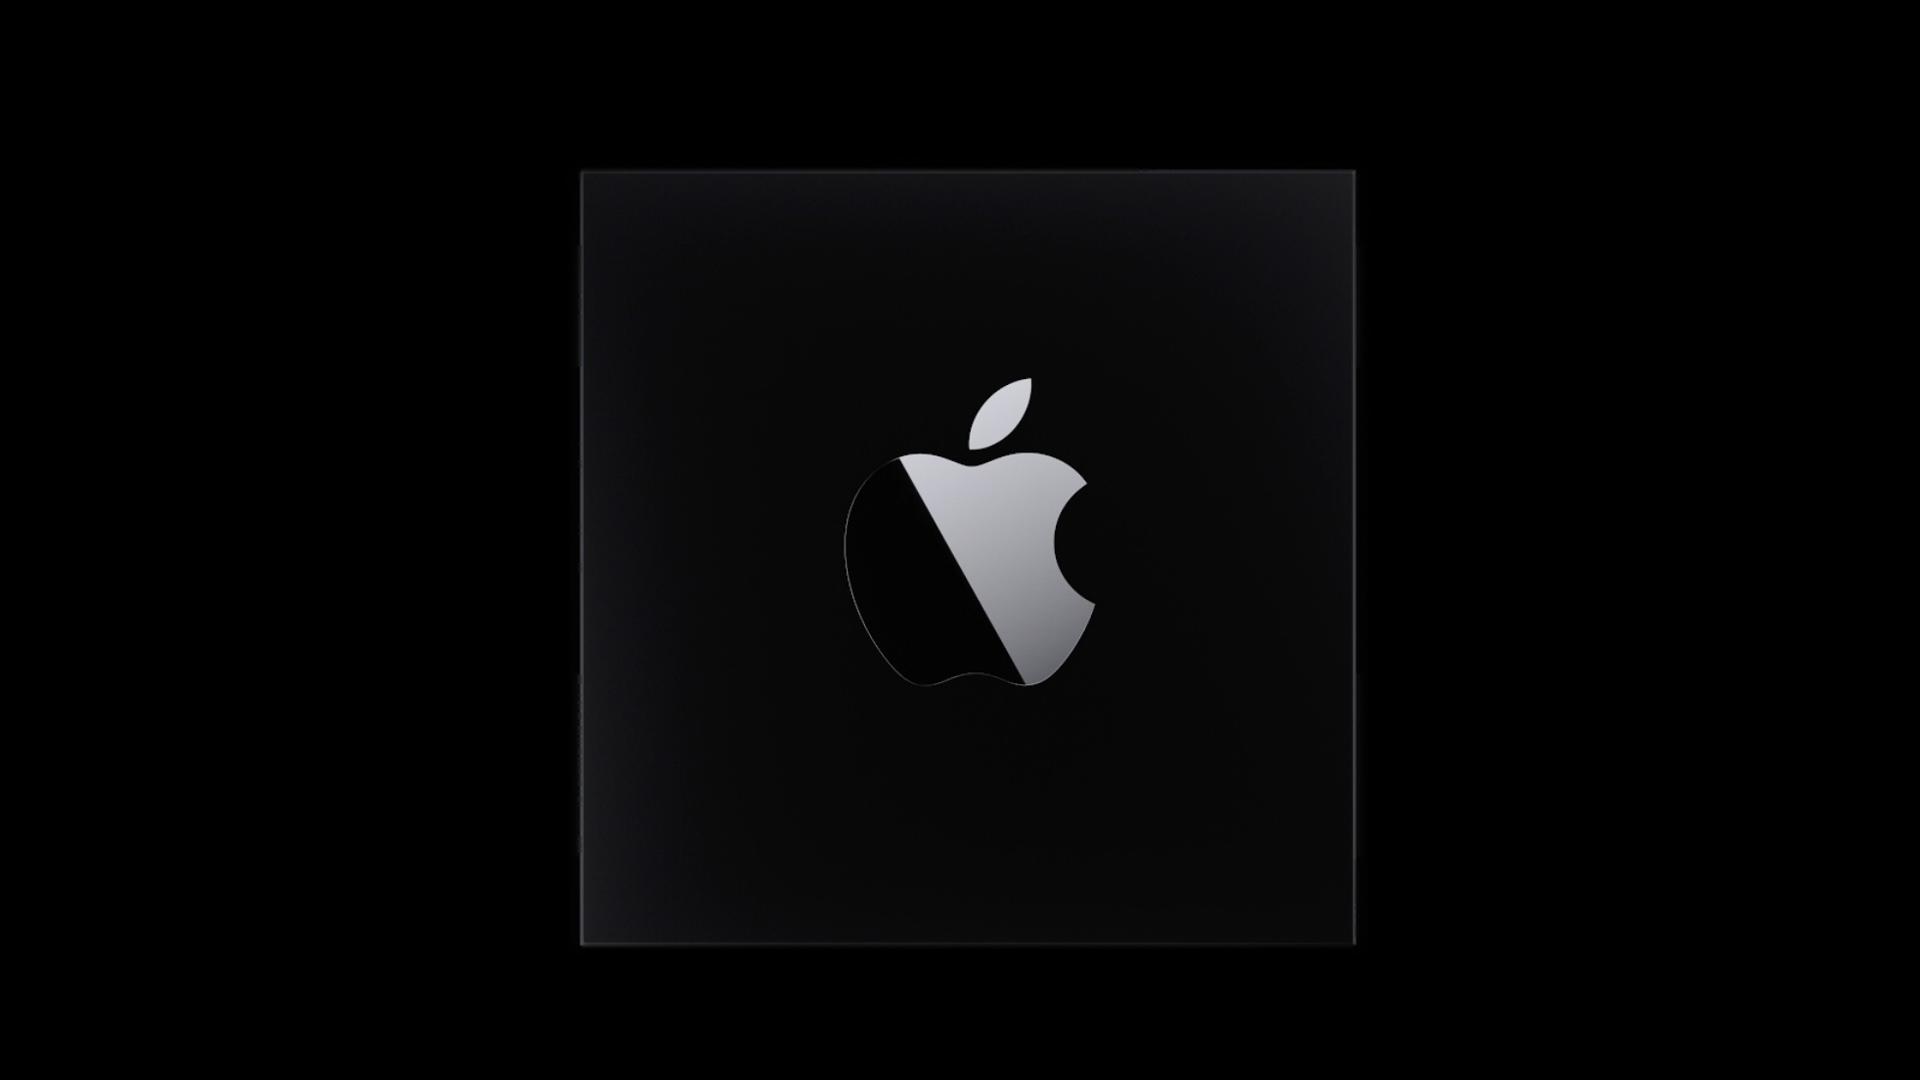 Apple WWDC 2020 Apple Silicon